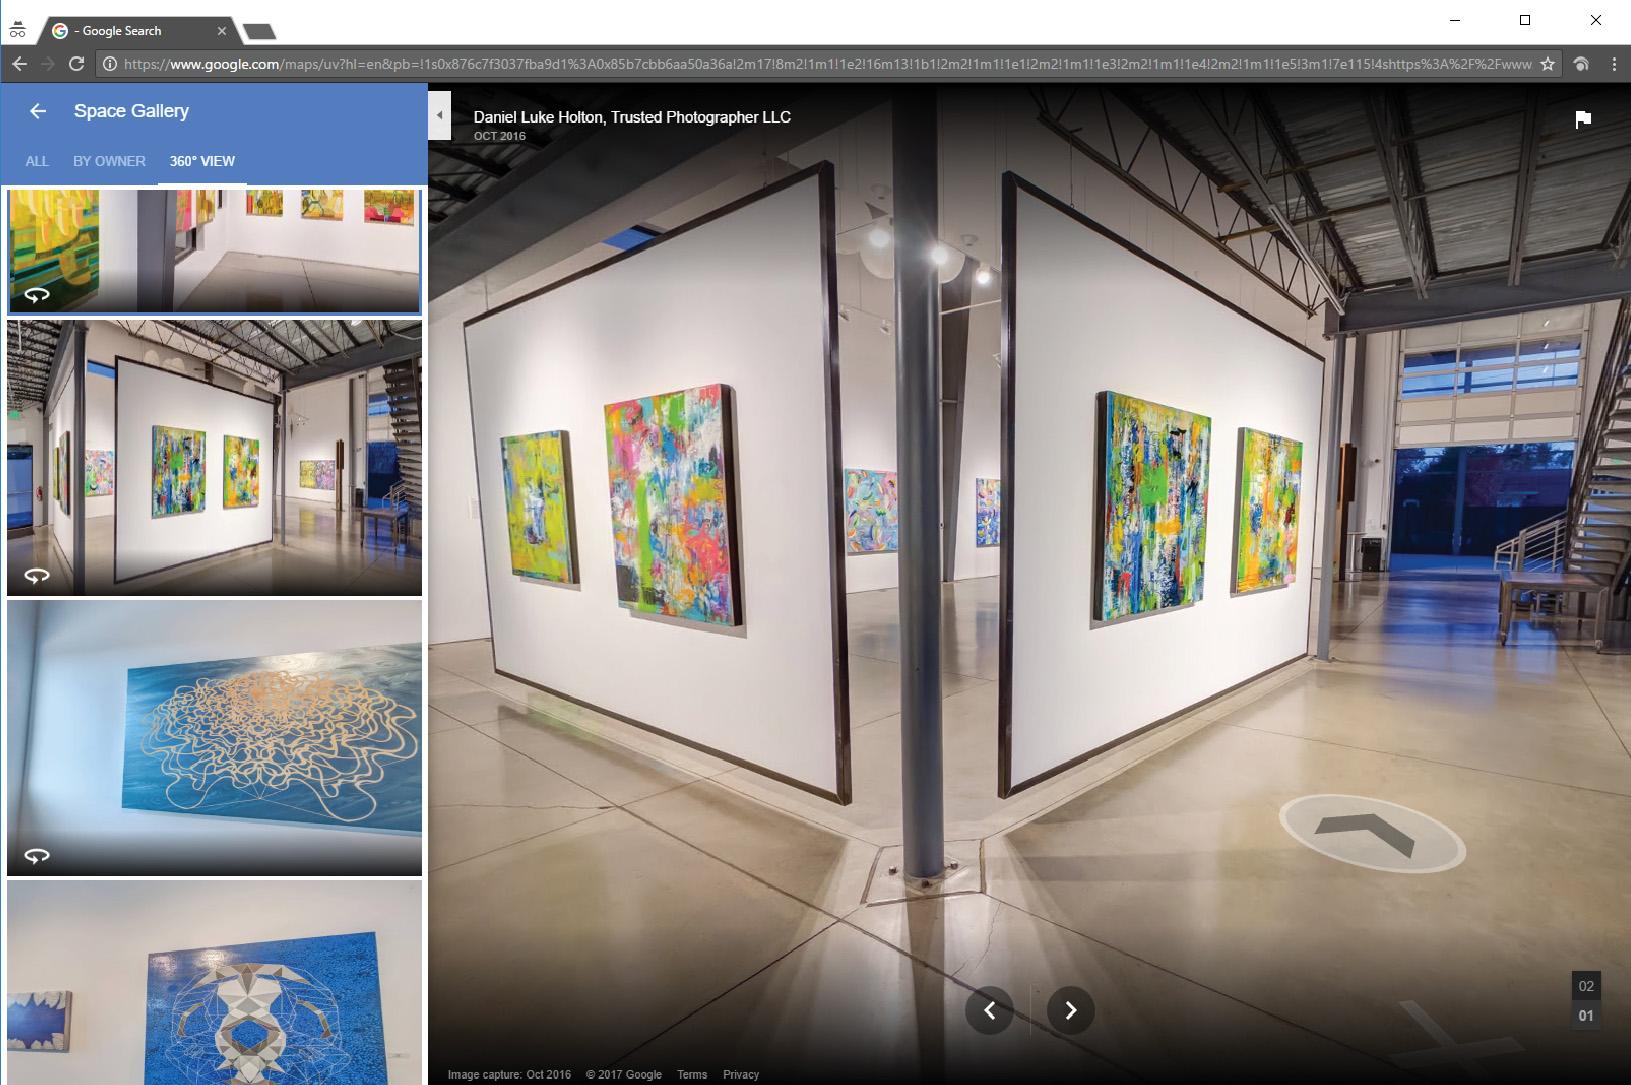 Gallery / Museum